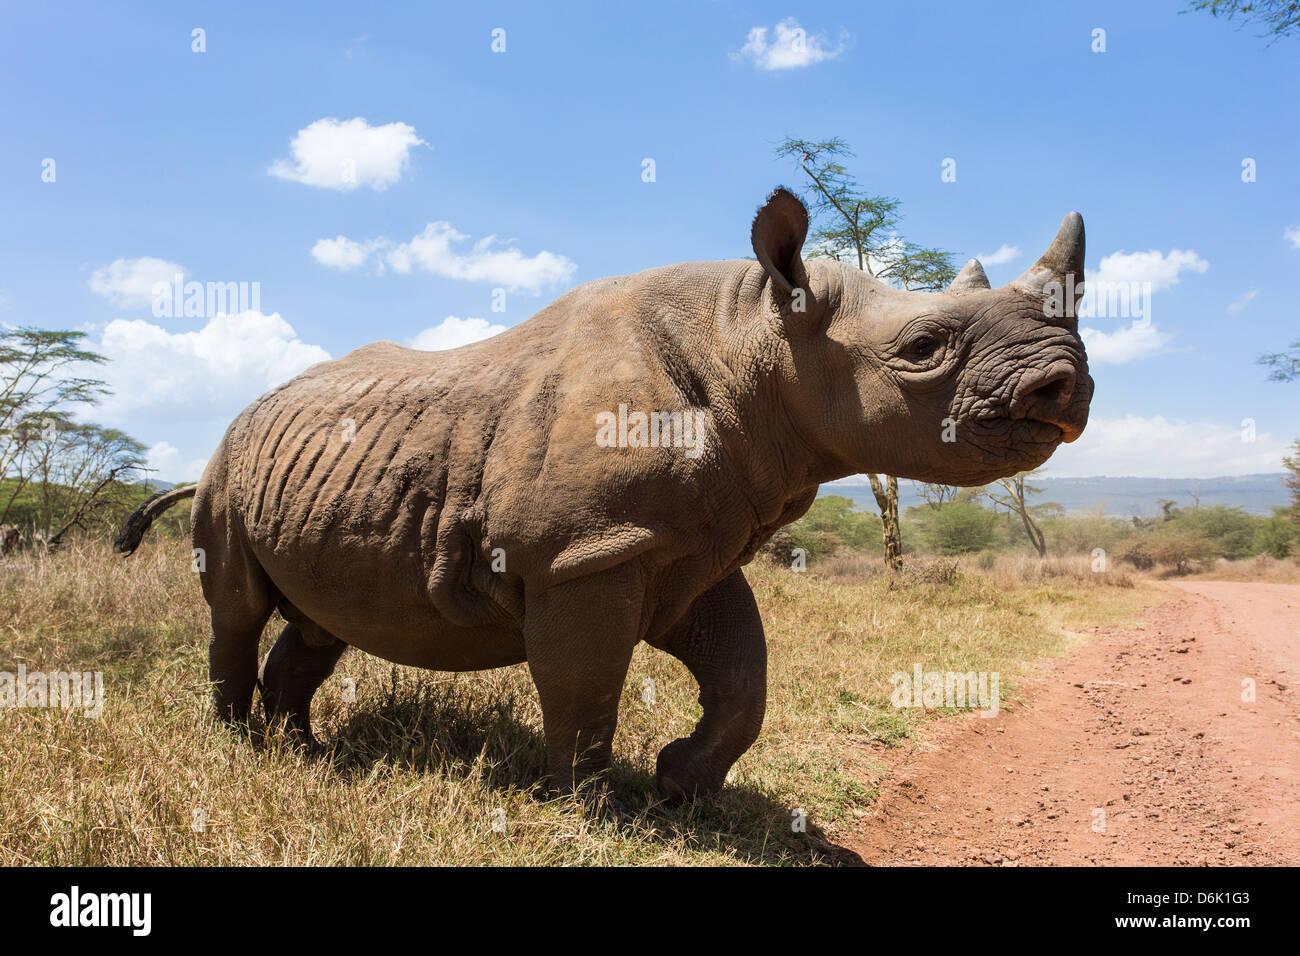 Rhino, Lewa Wildlife Conservancy, Laikipia, Kenya, East Africa, Africa - Stock Image